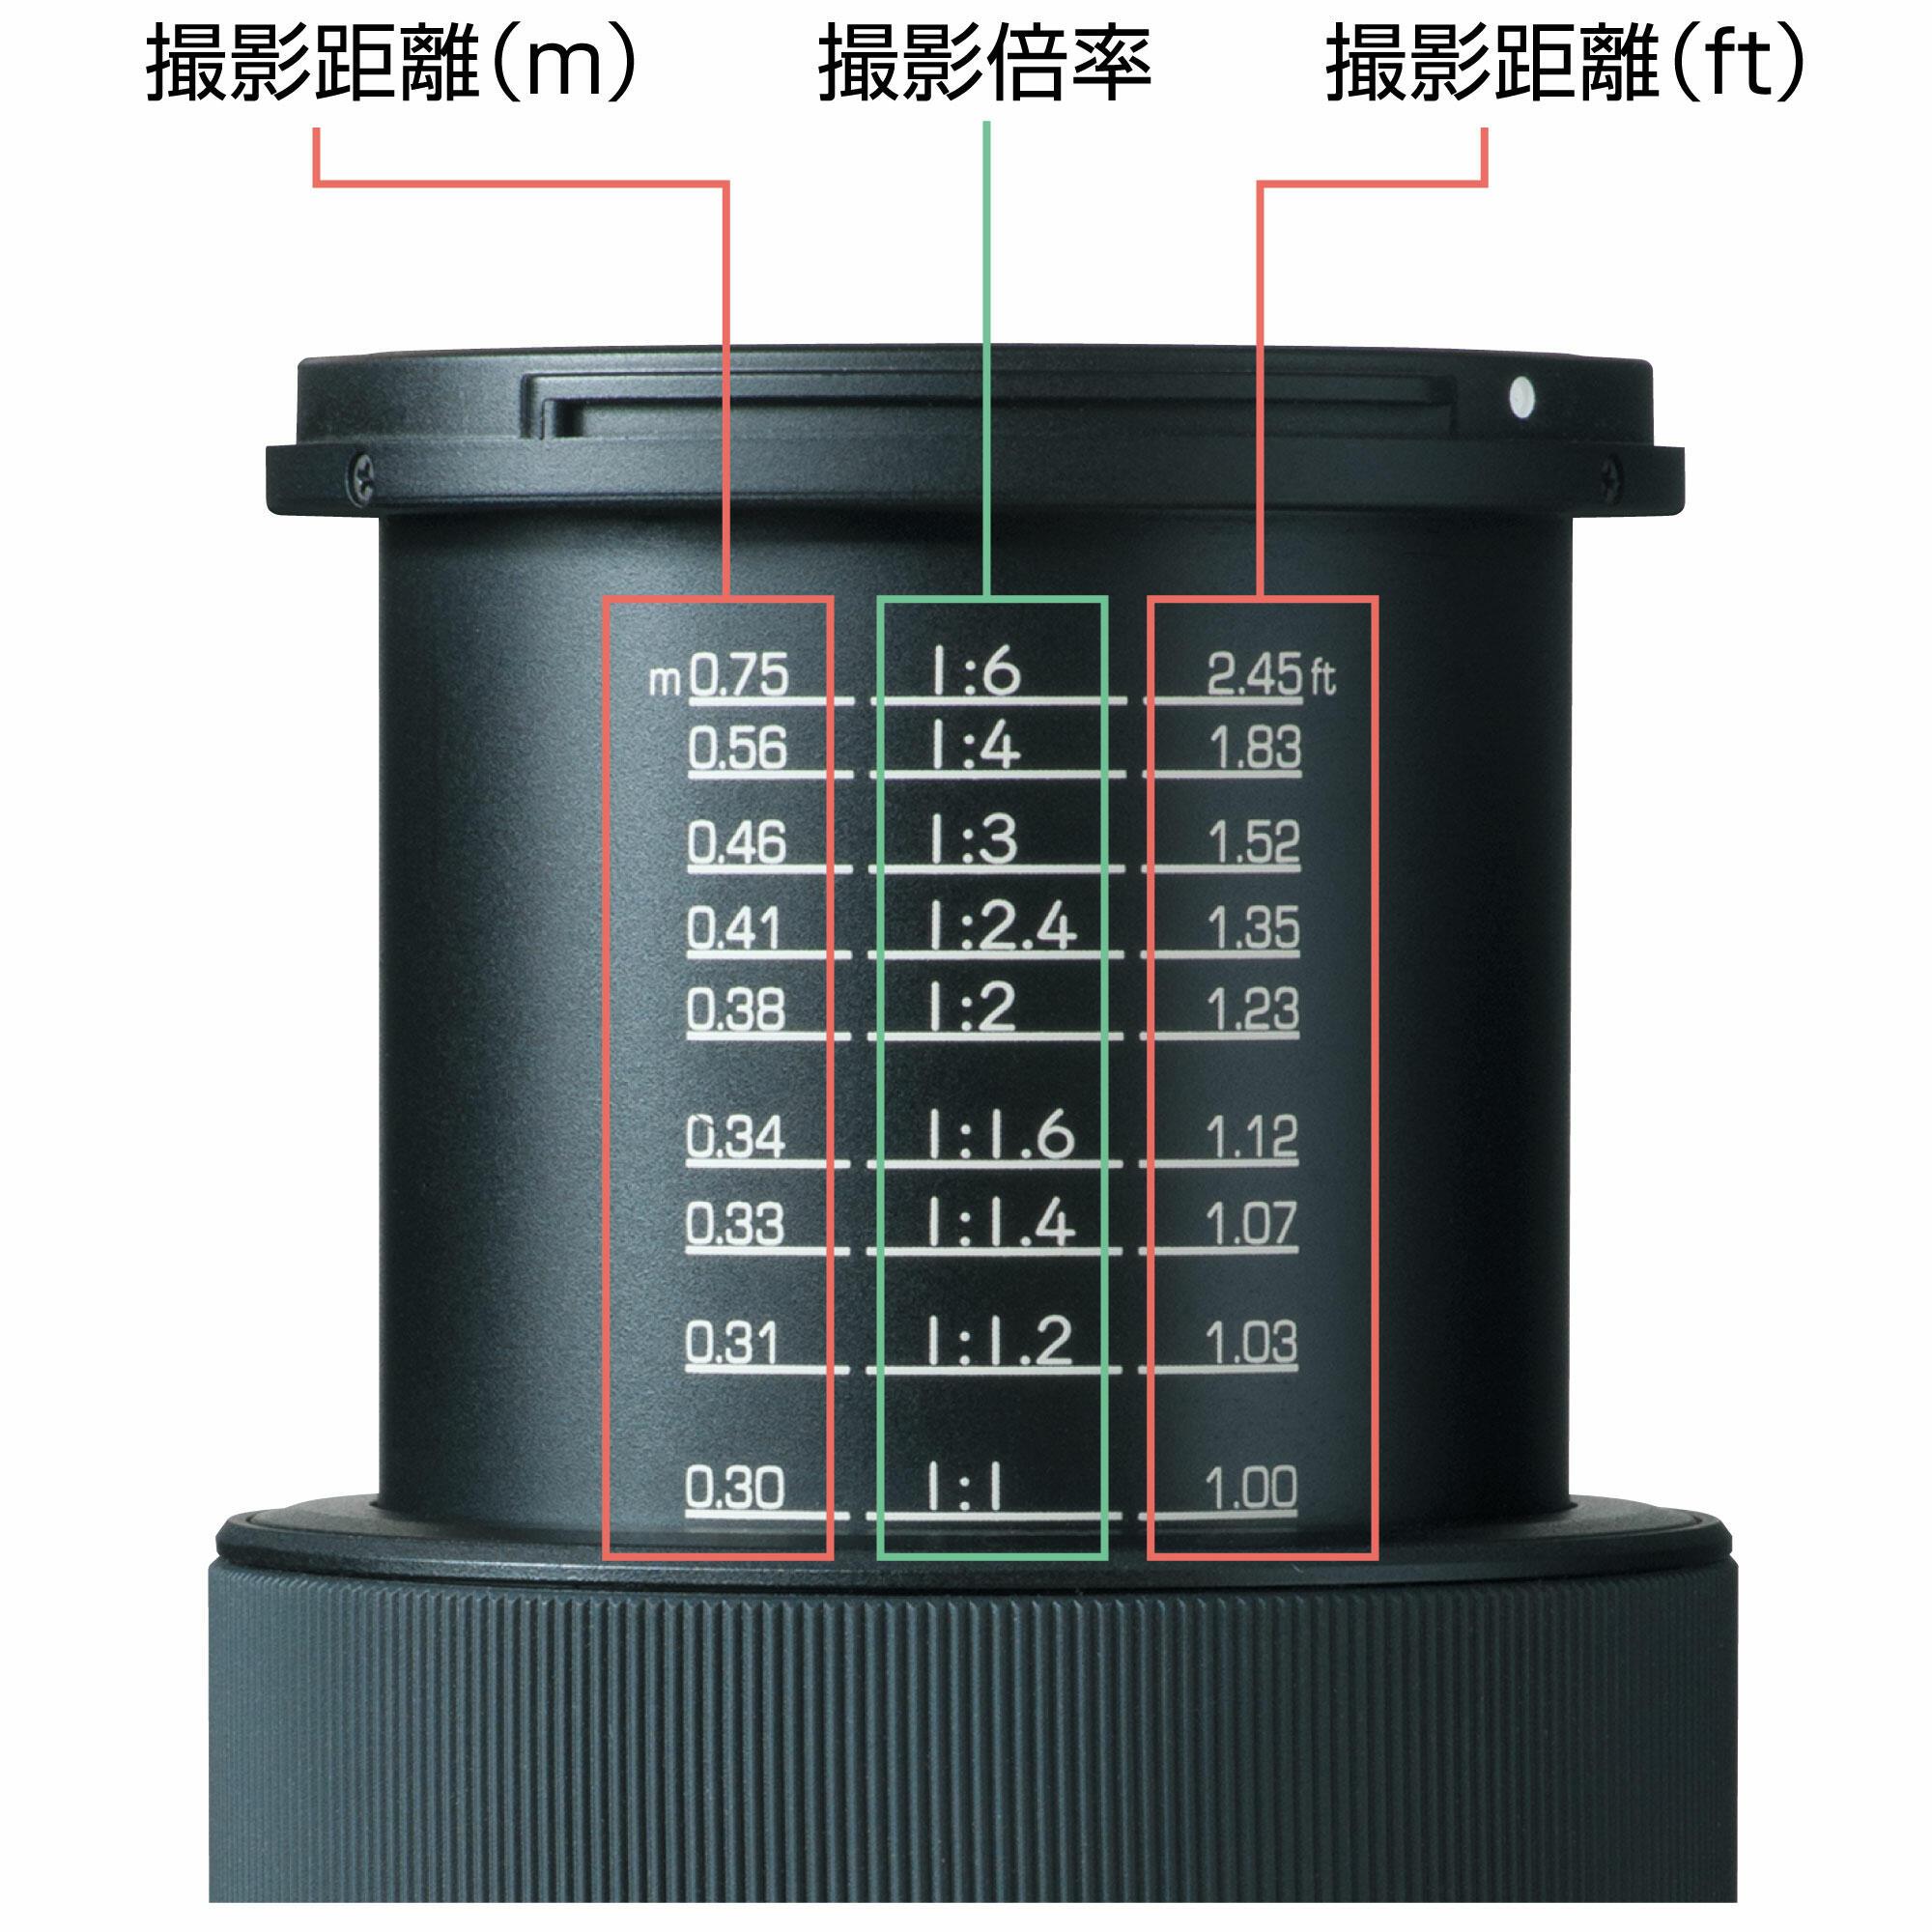 https://www.kenko-tokina.co.jp/camera-lens/tokina/mt-images/firin100mm_macrodistance.jpg